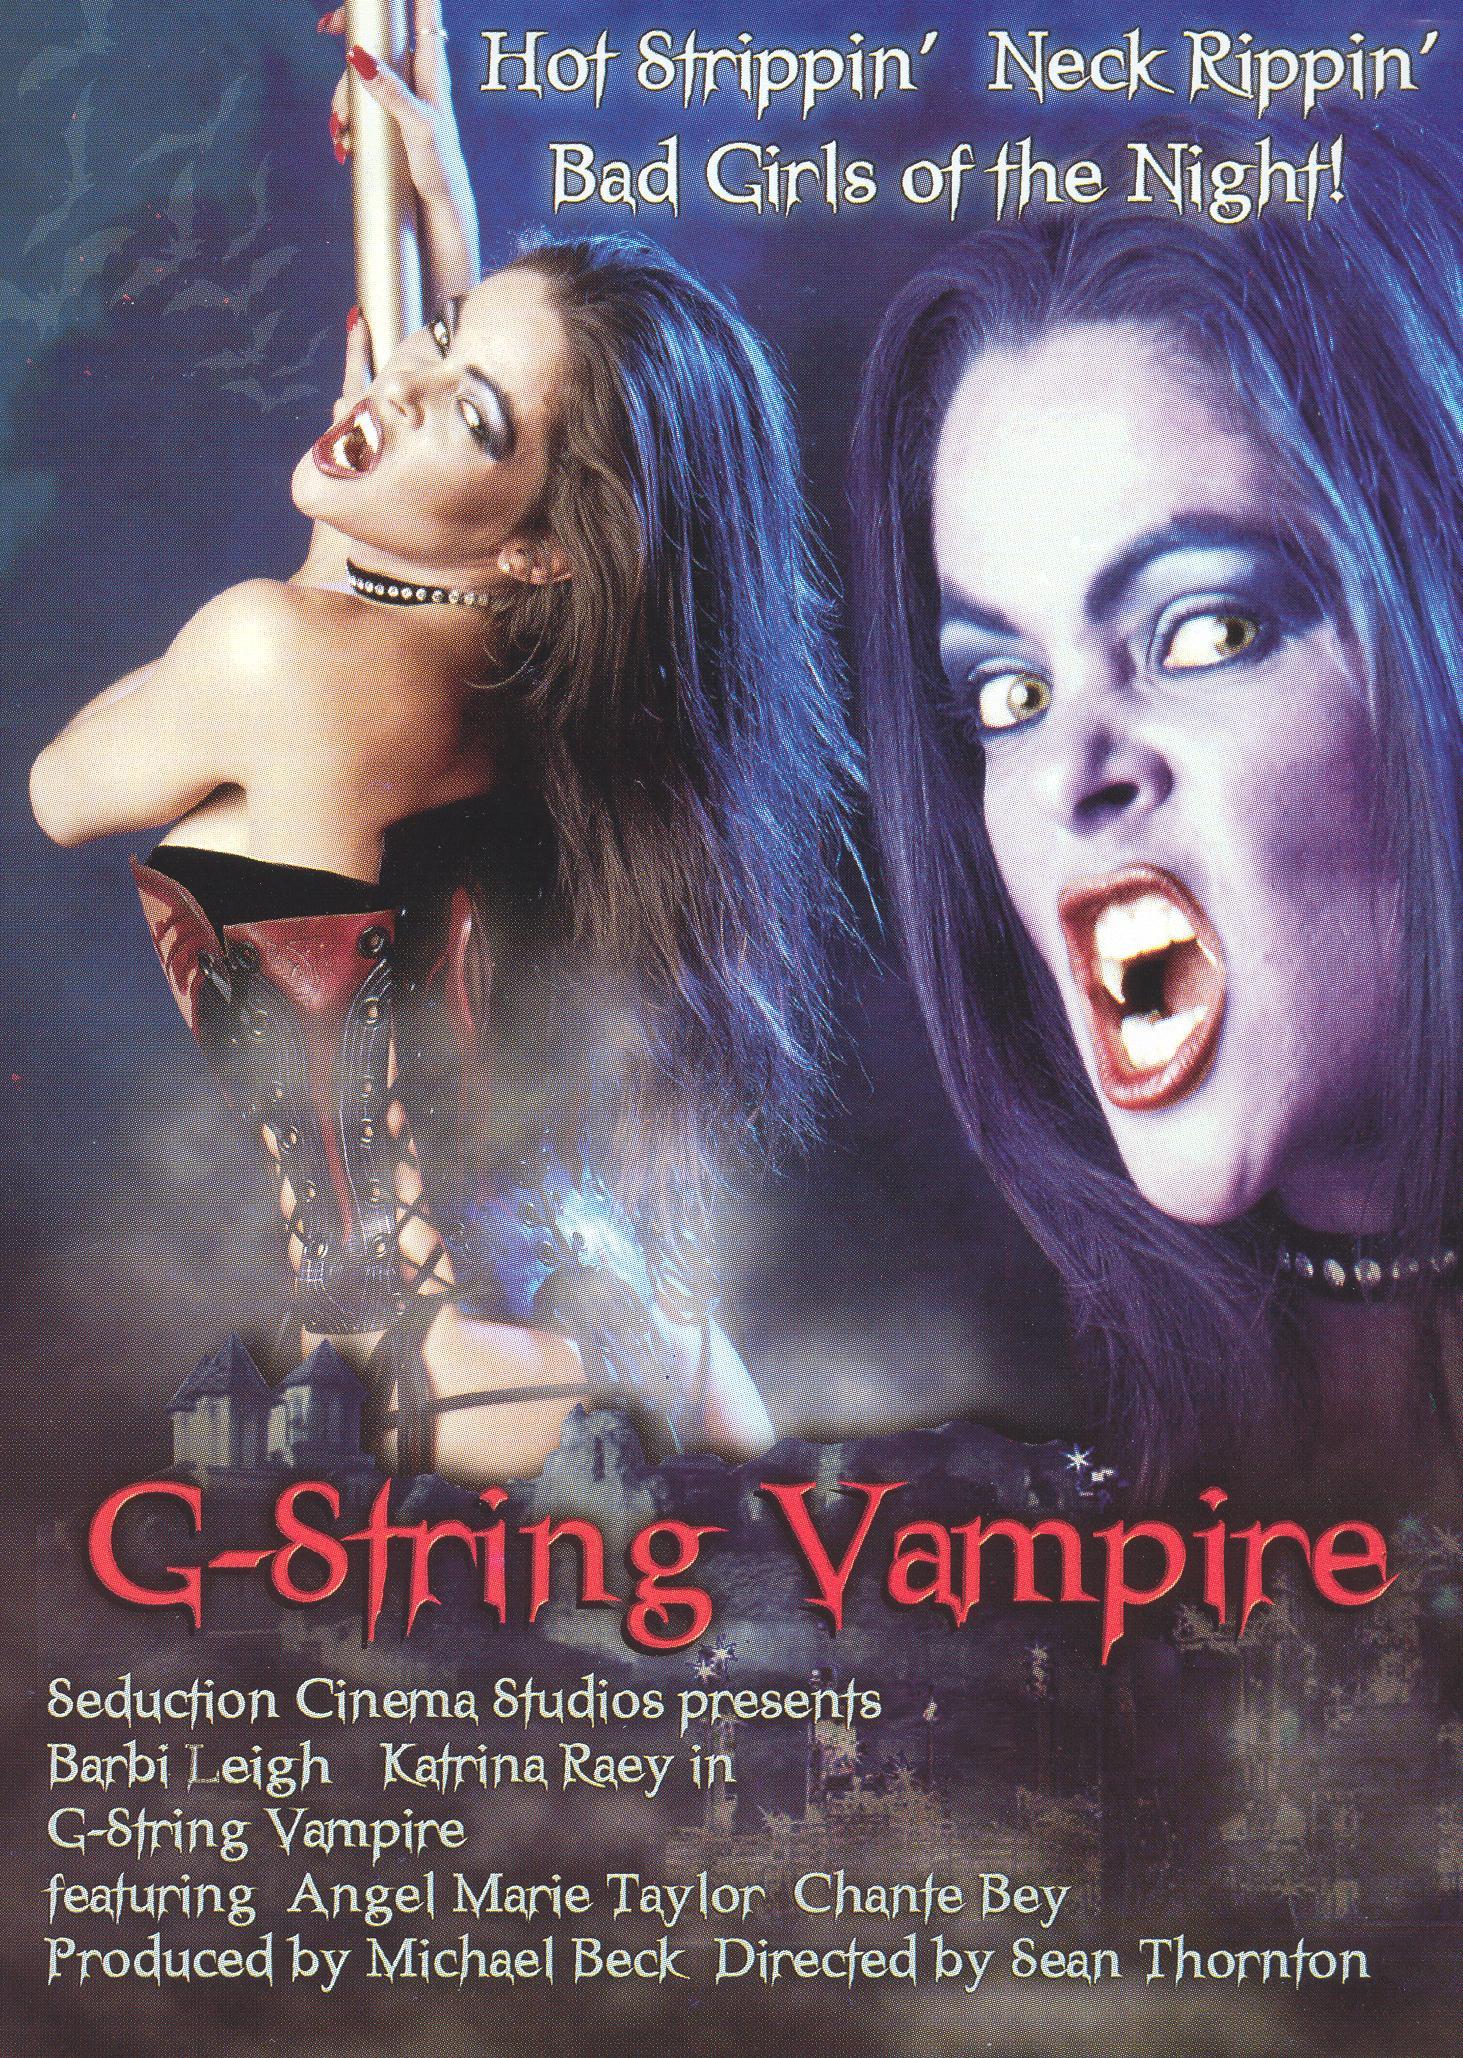 Free downloading hot vampire film hentai photos